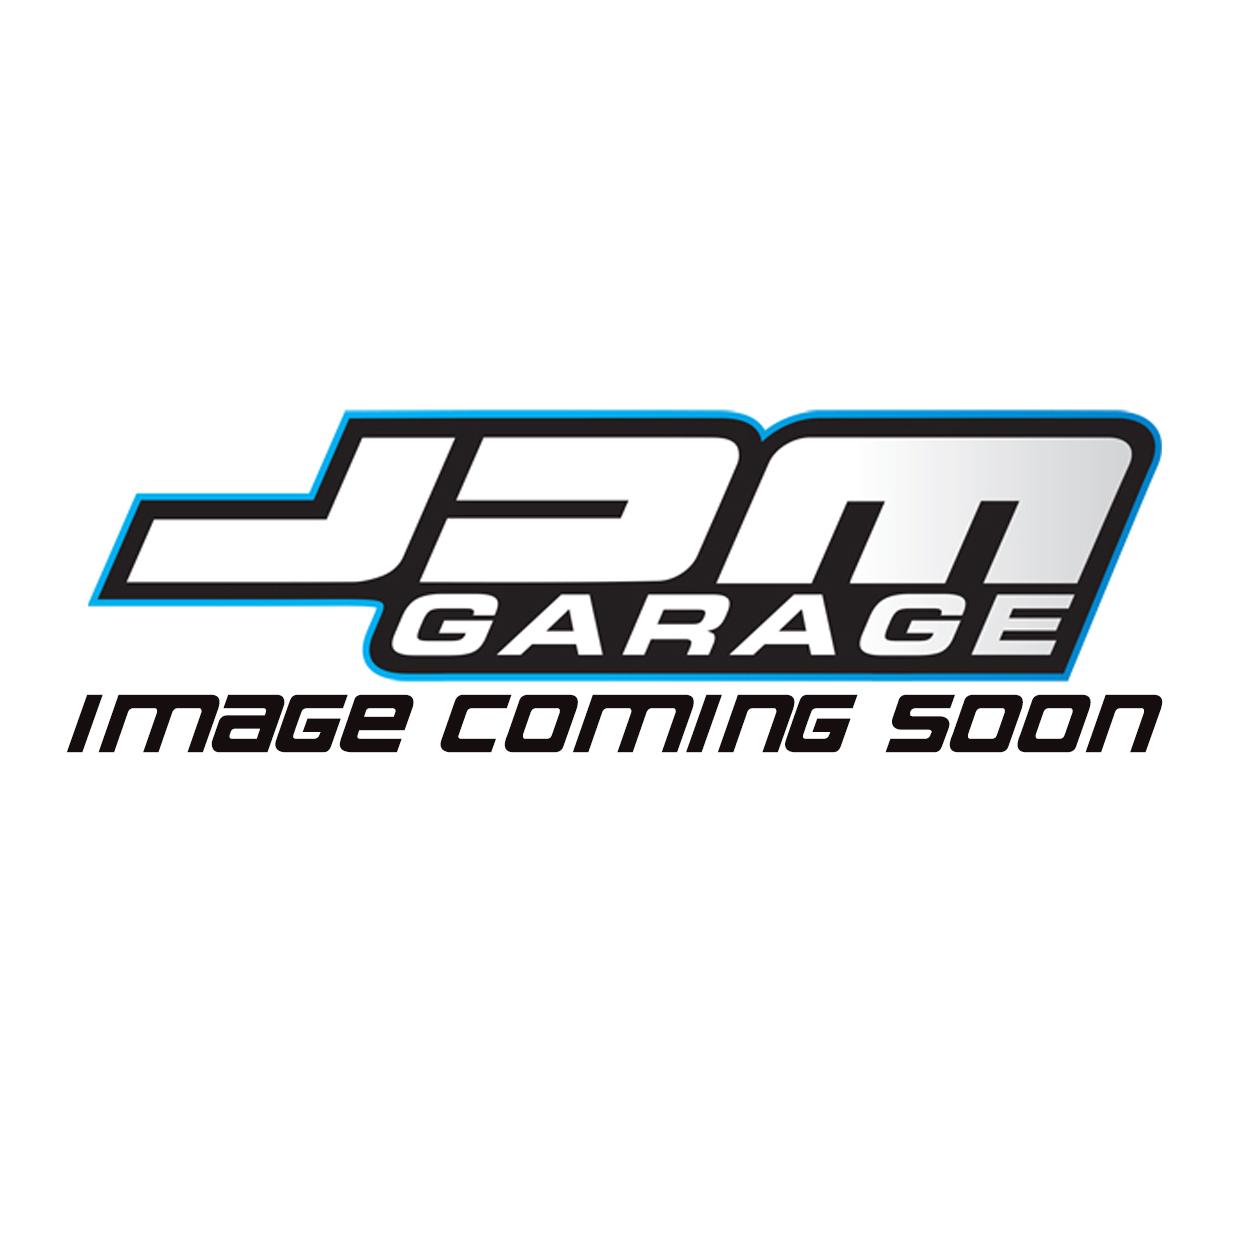 Genuine Nissan Front Brake Pad Pin Clip Skyline R32 GTS-4 GTST GTR R33 GTST R34 GTT / Fairlady Z 300ZX Z32 41218-30P00